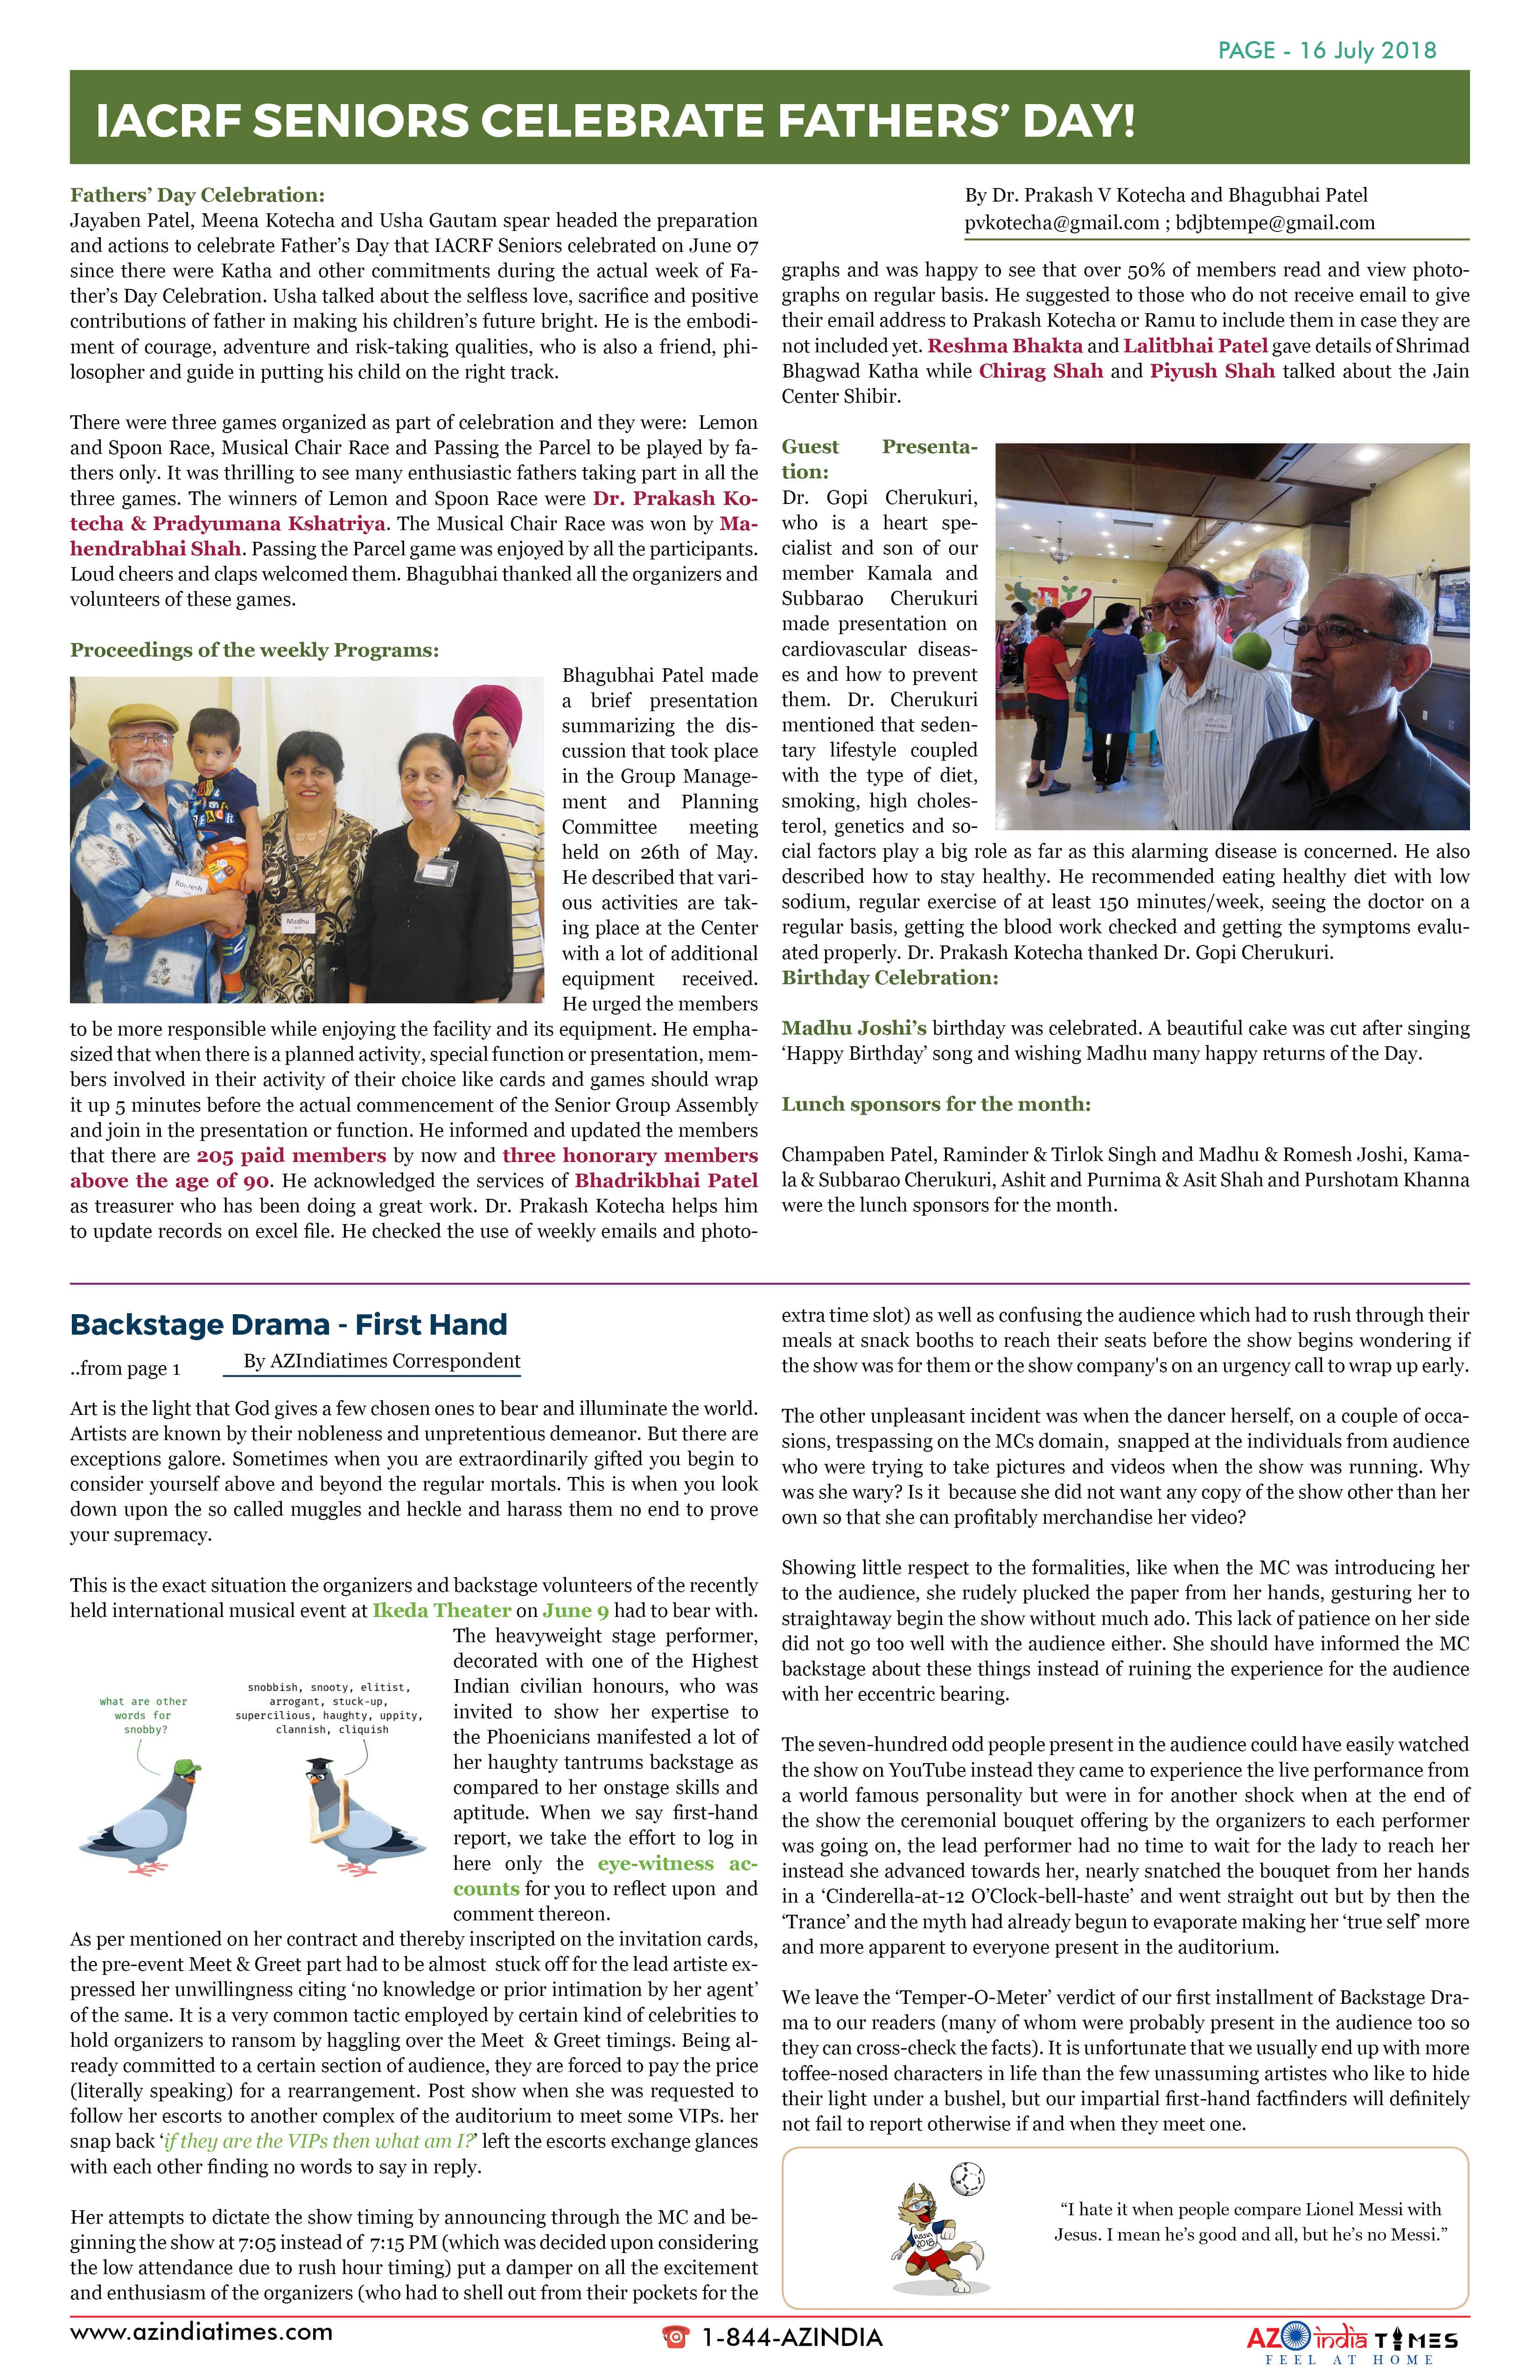 AZ INDIA JULY EDITION16